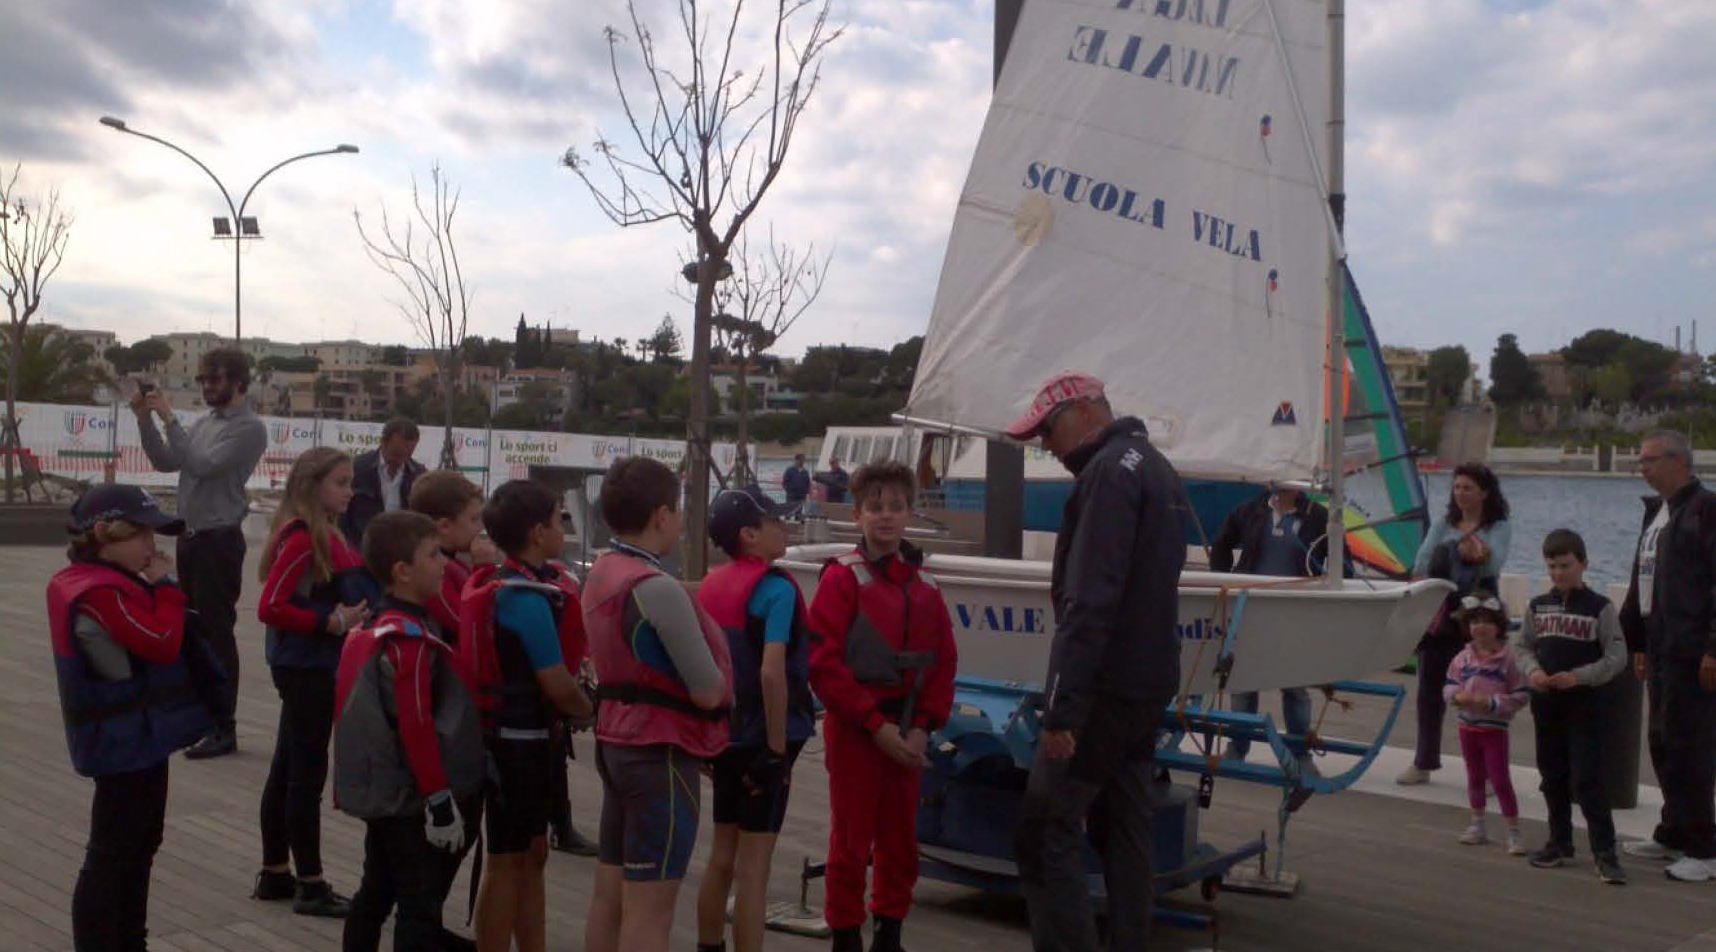 Lega Navale Italiana Brindisi Gruppo Sportivo Vela 5